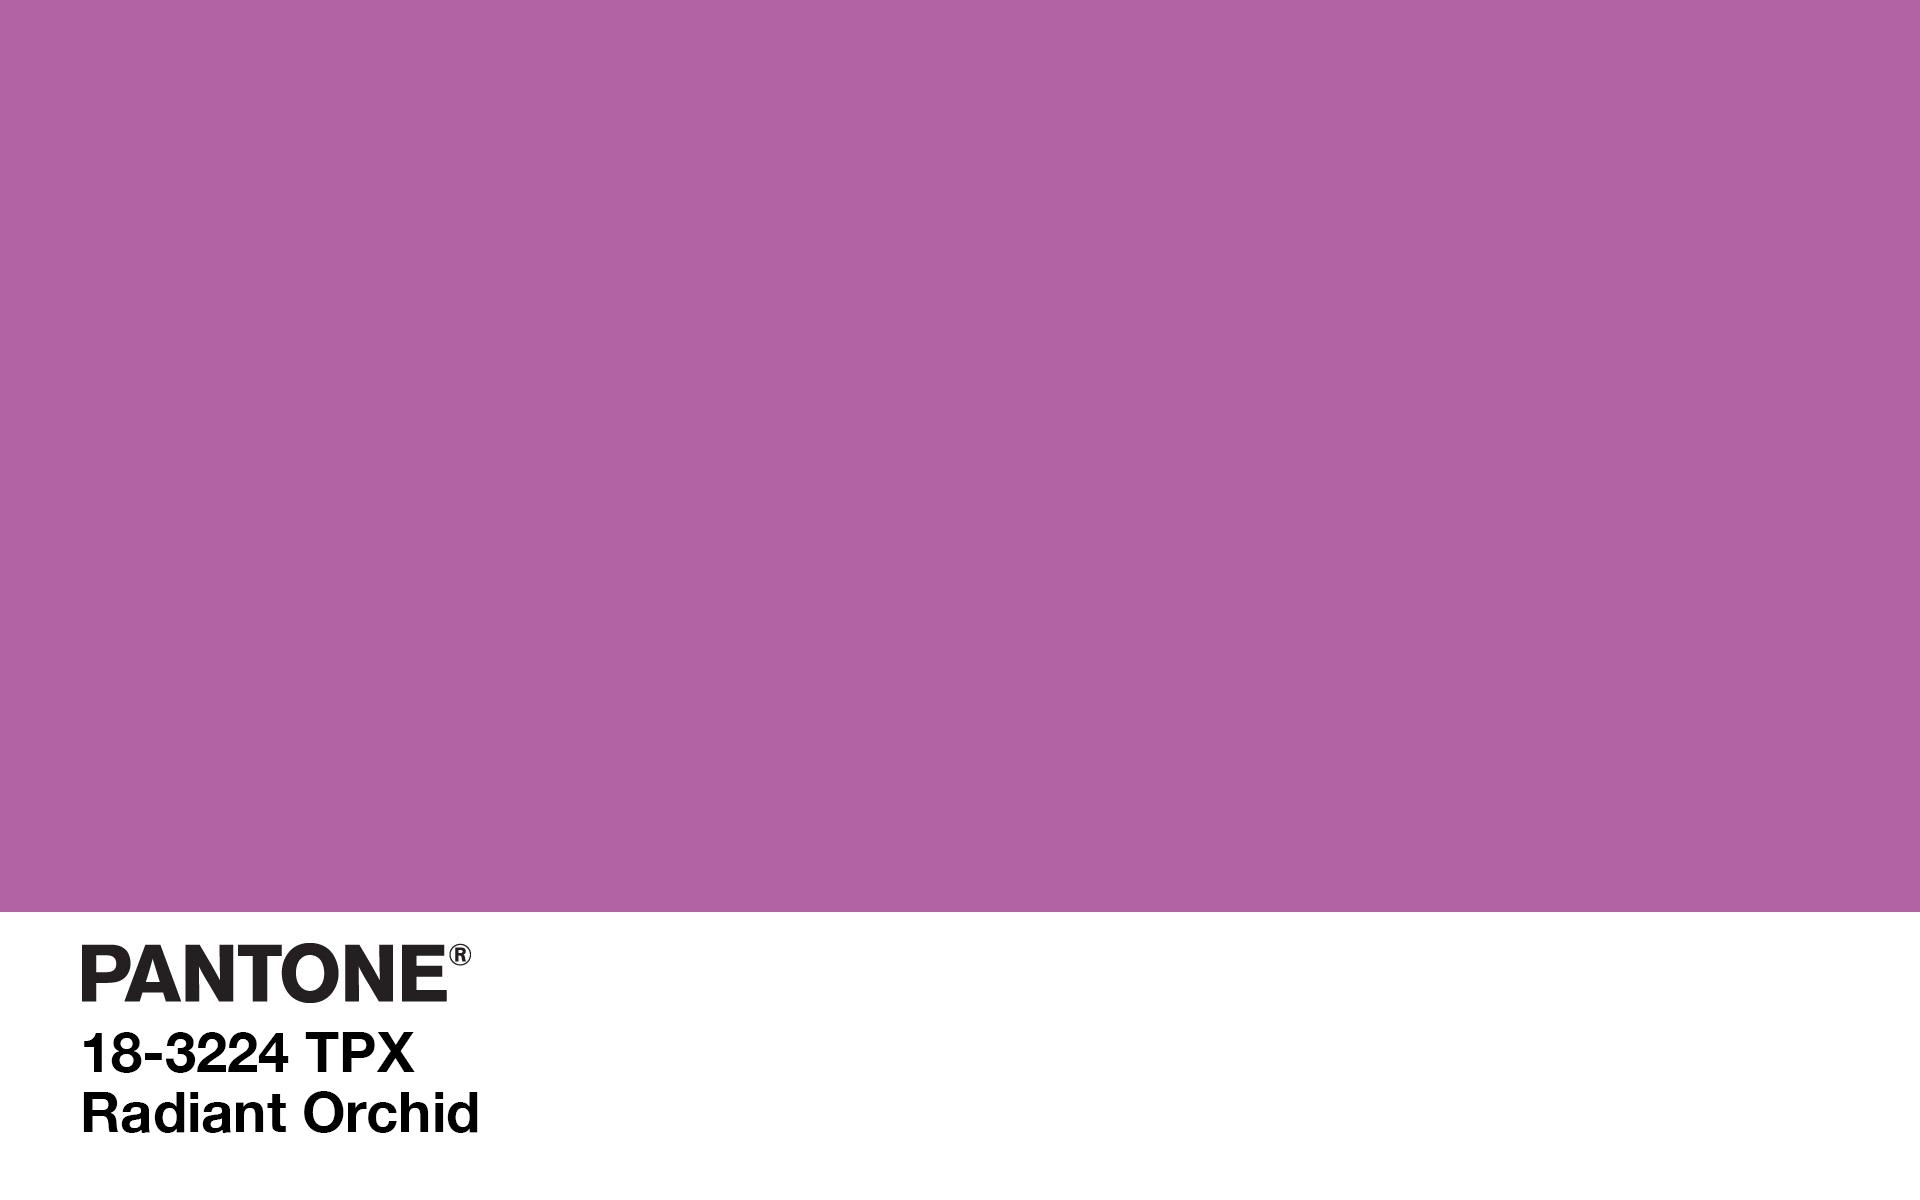 Pantone Radiant Orchid Computer Wallpaper 1920 x 1200 1920x1200